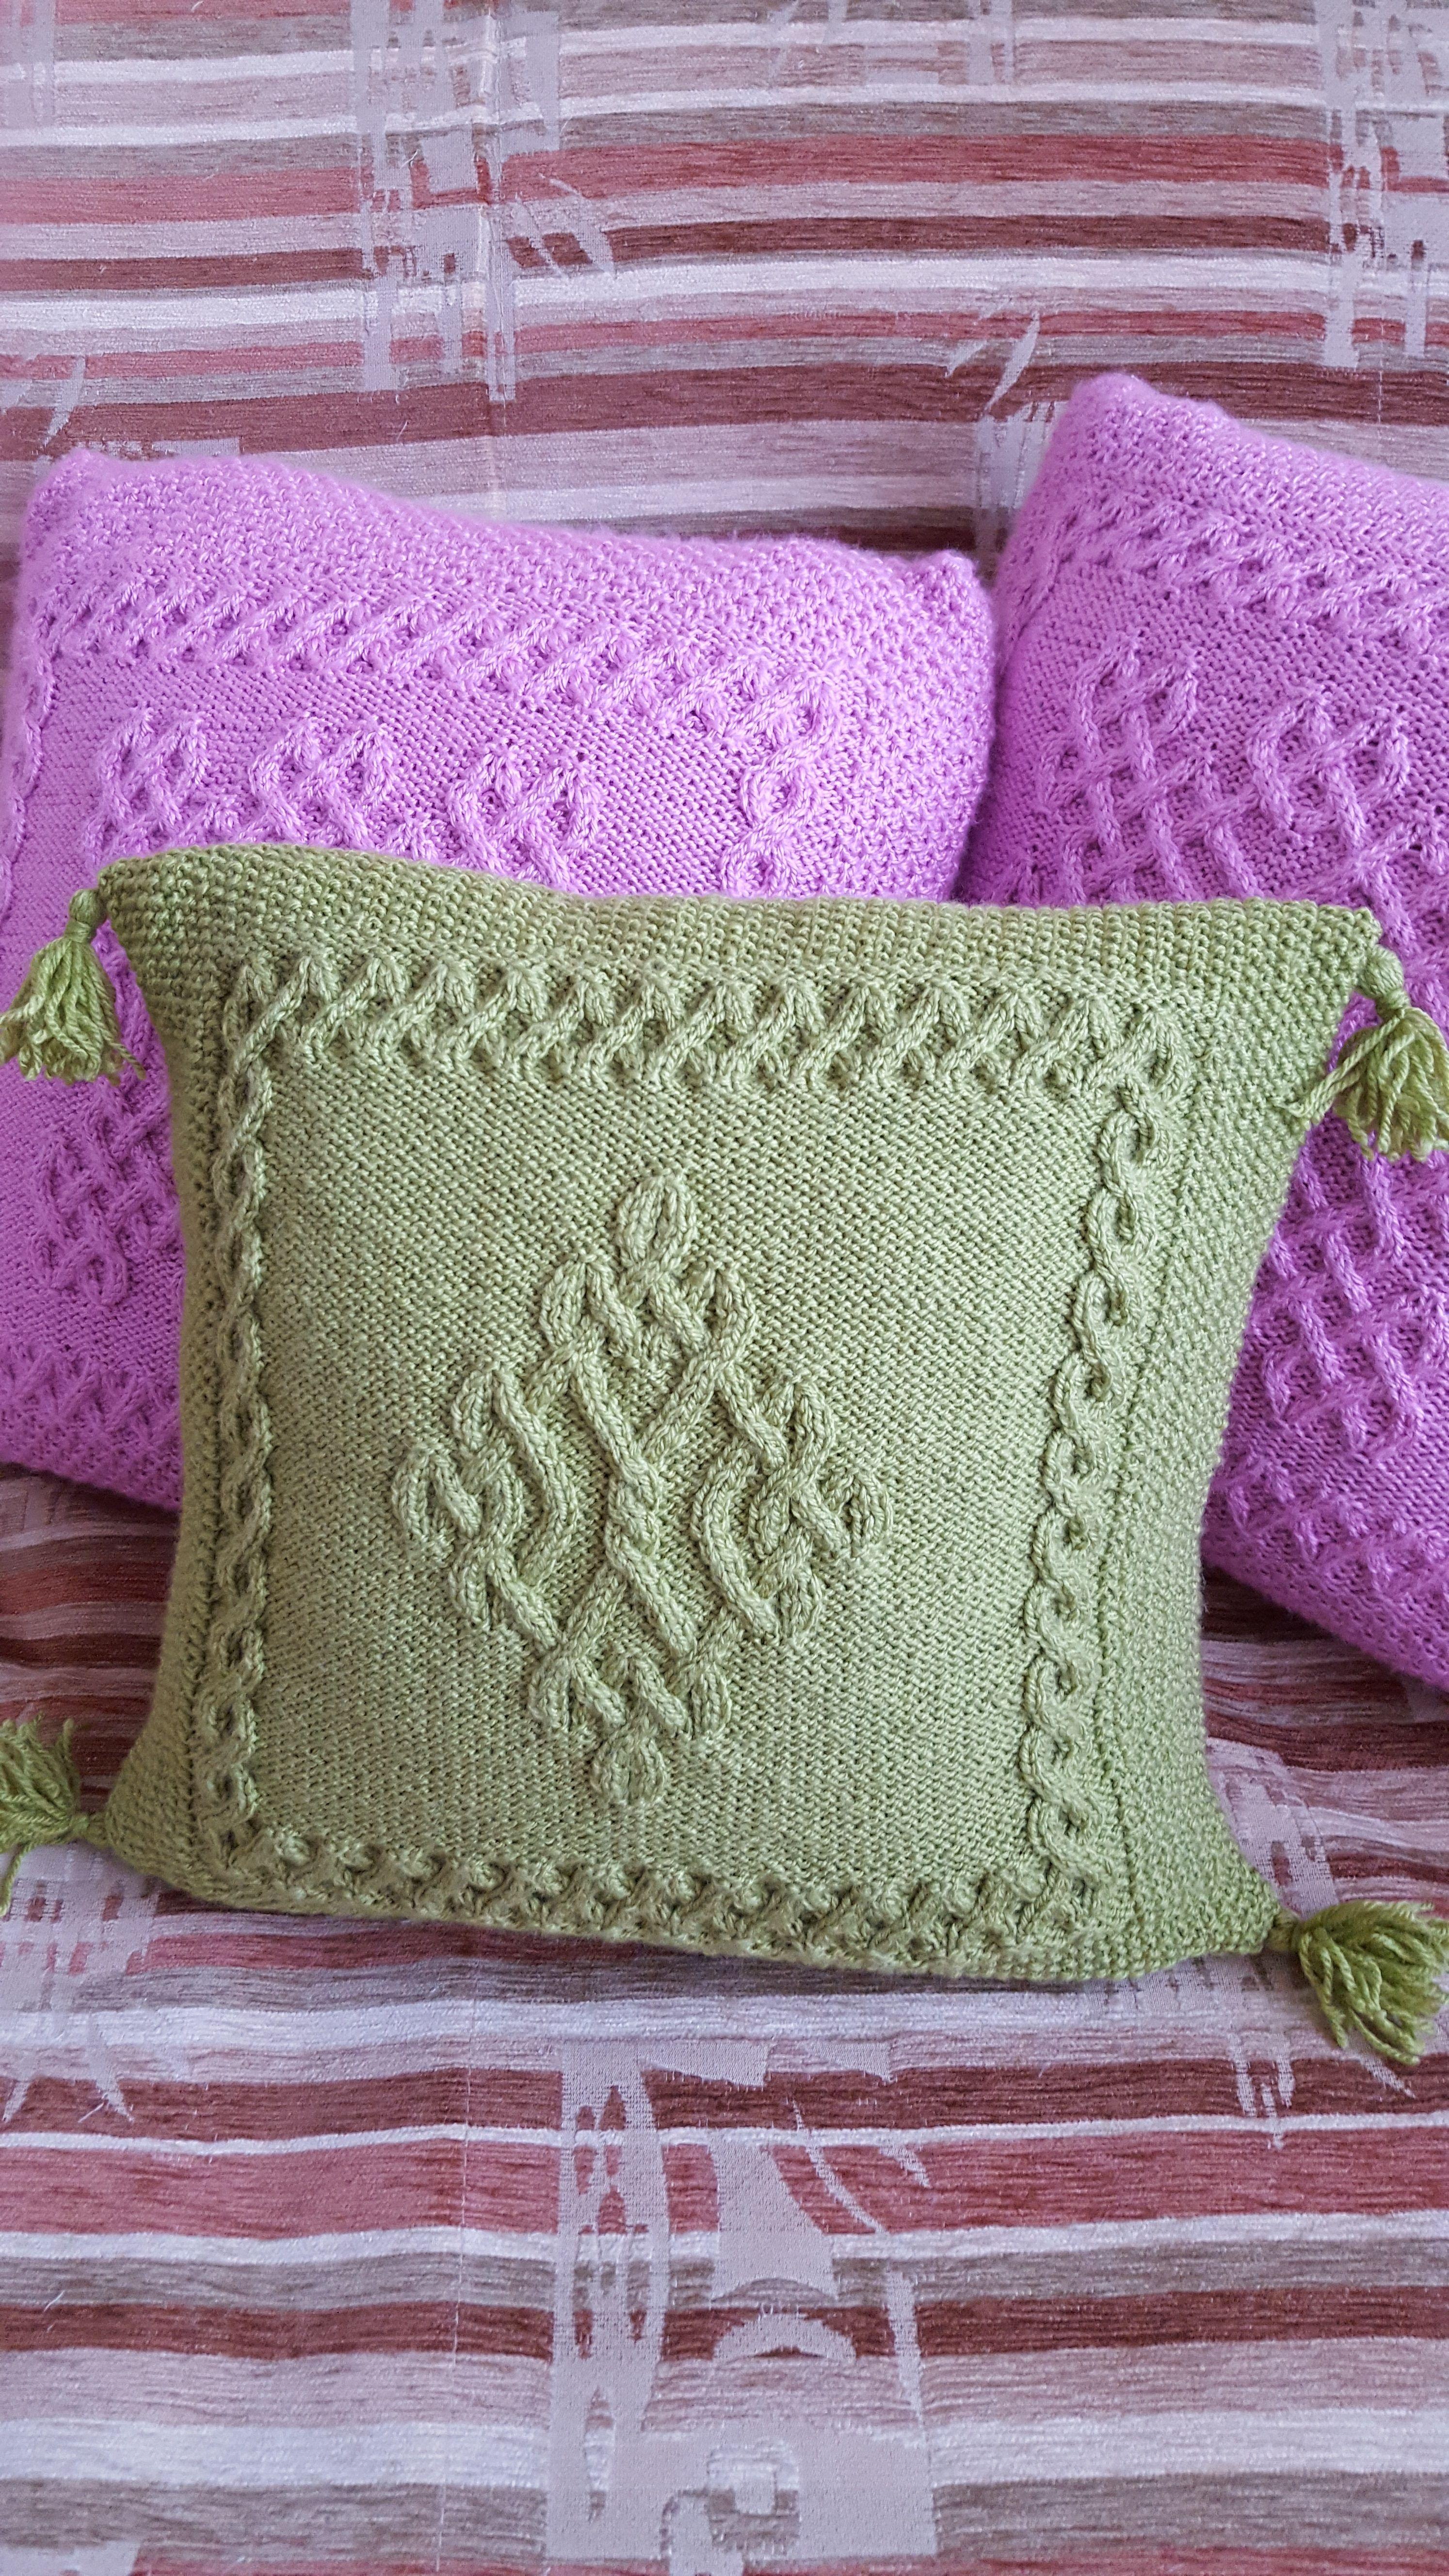 Pin by jennifer hopkins on knit housewares pinterest knit pillow